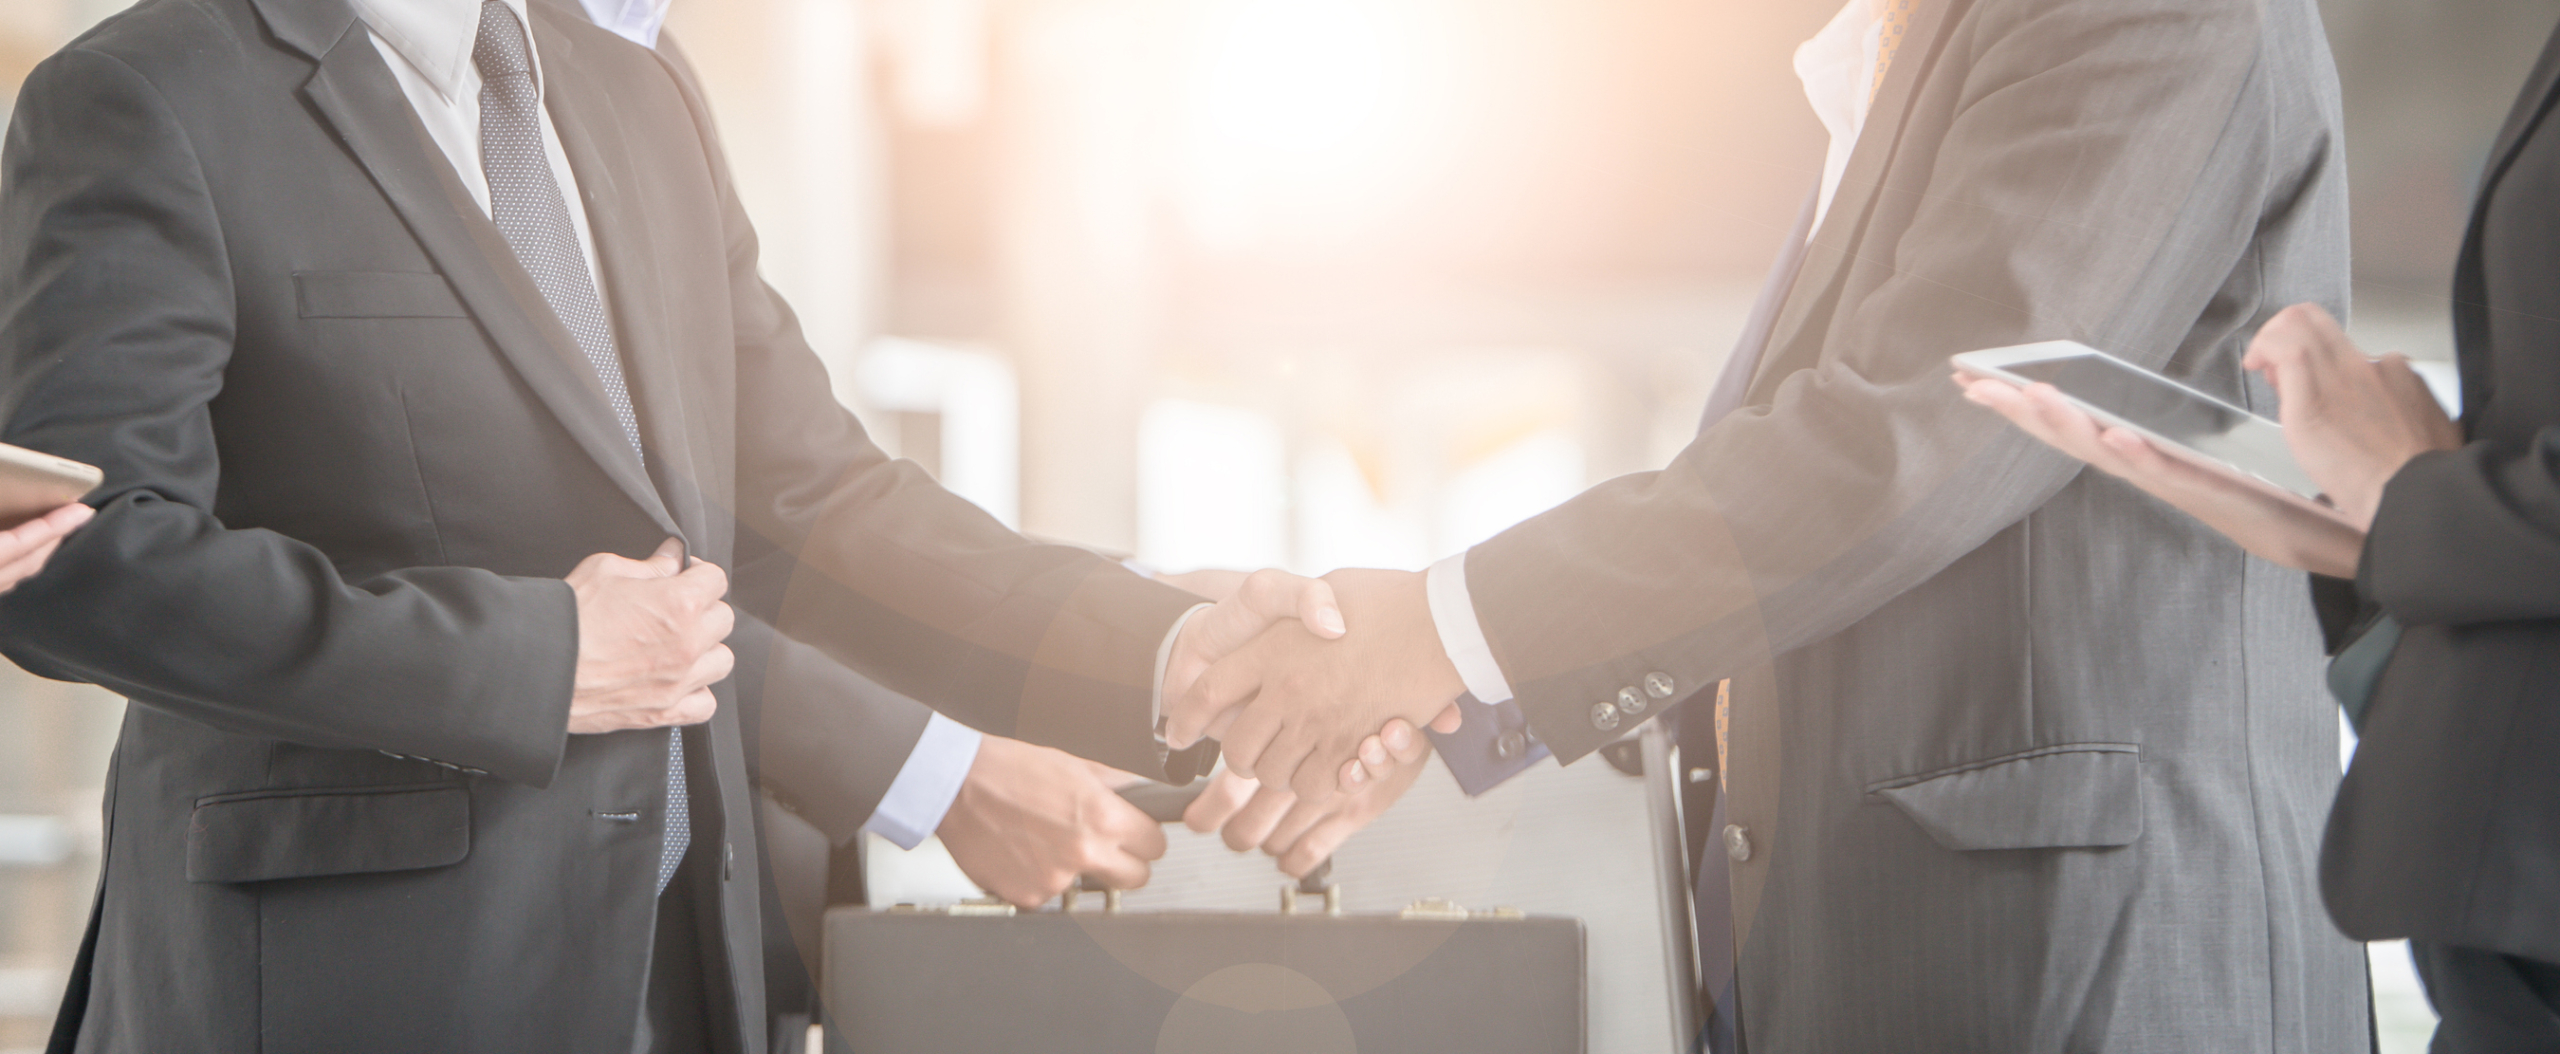 Business-handshake-agreement